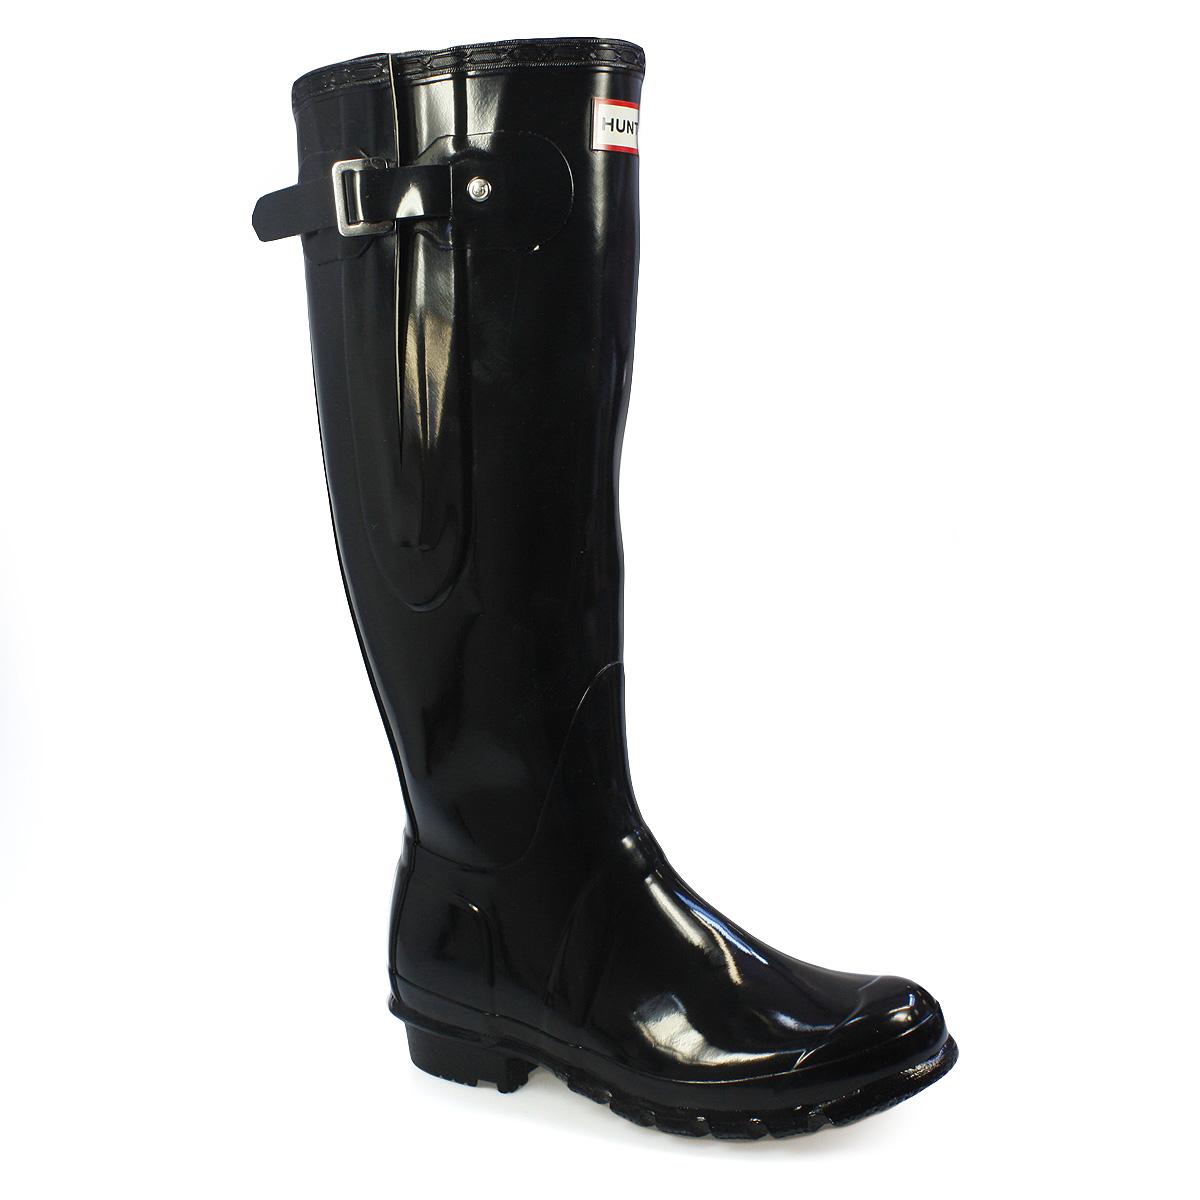 hunter original high adjust gloss black wellington boots shoes women size 3 8. Black Bedroom Furniture Sets. Home Design Ideas